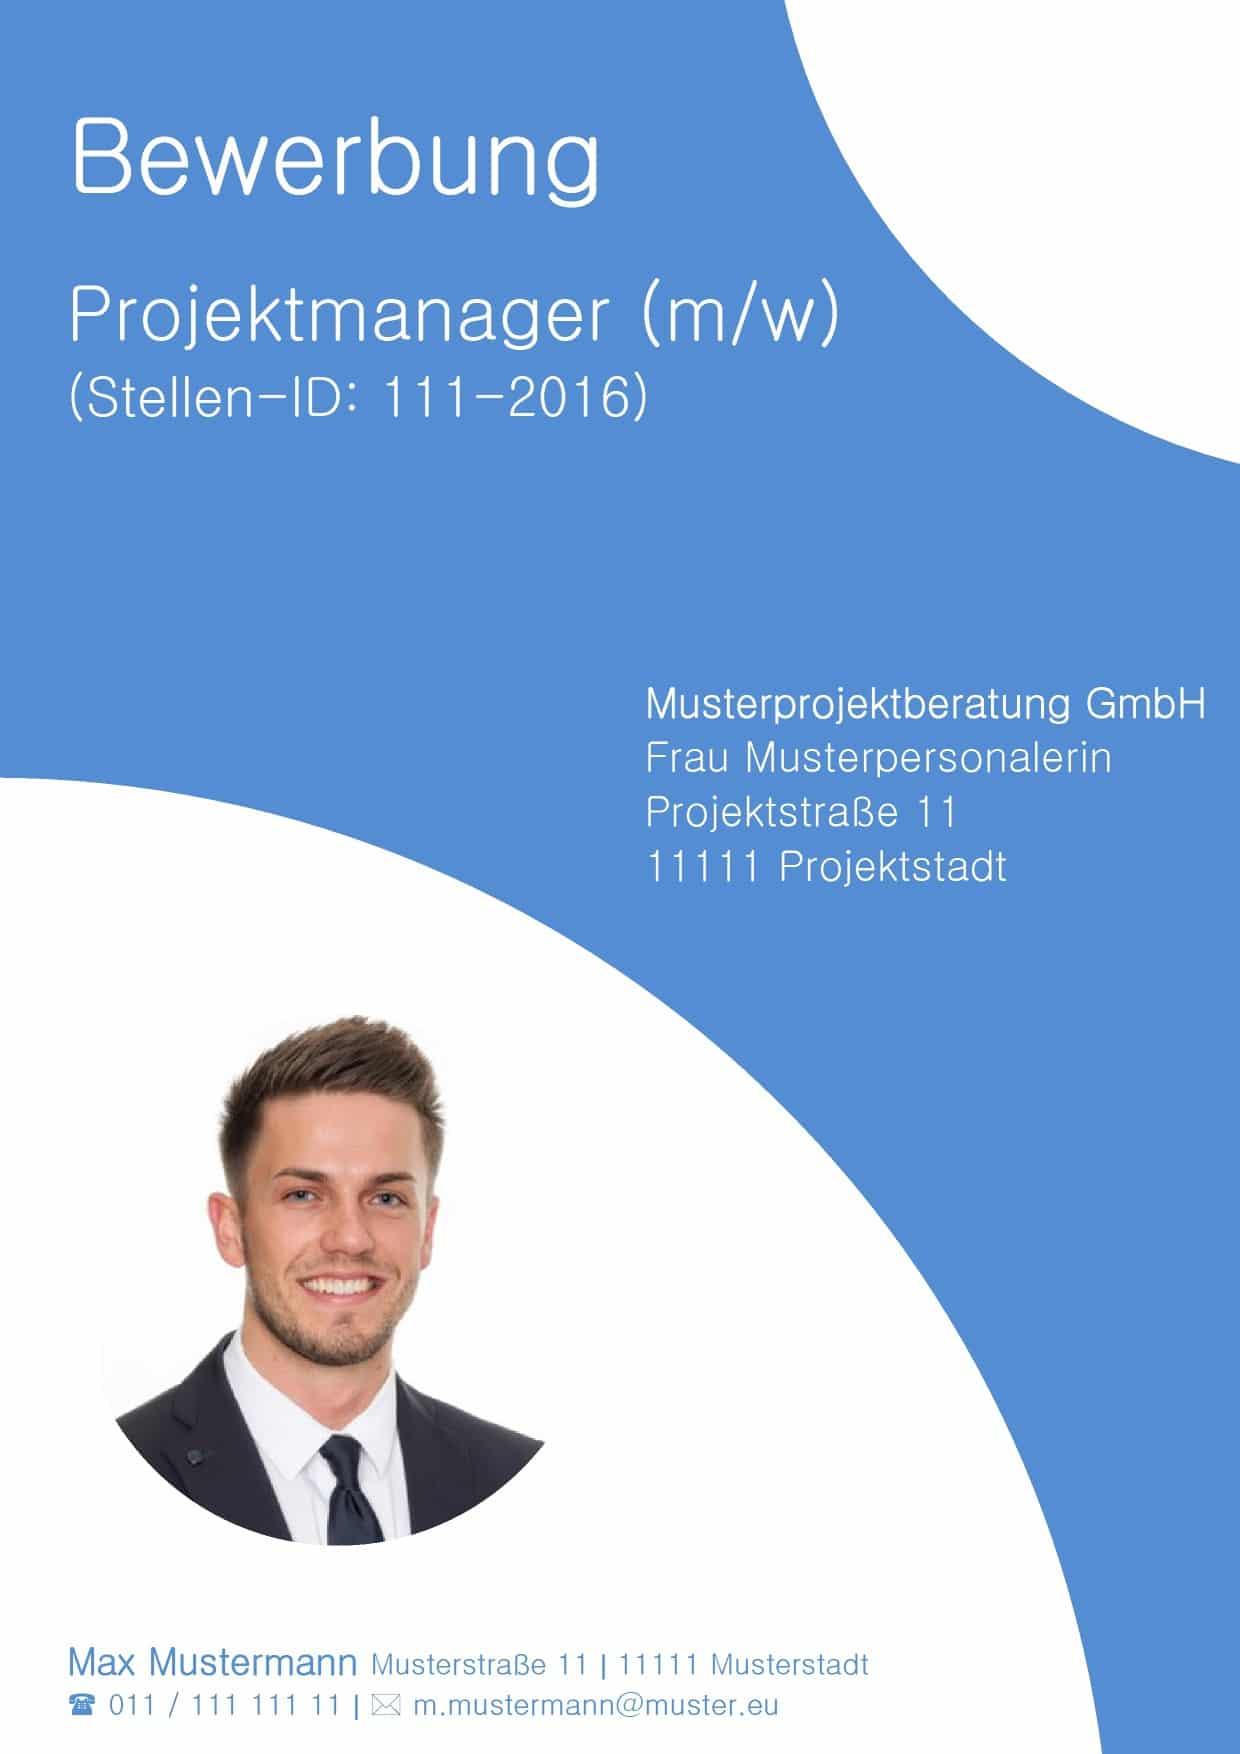 Deckblatt Bewerbung 21 - Projektmanager / Projektleiter / Projektmanagement